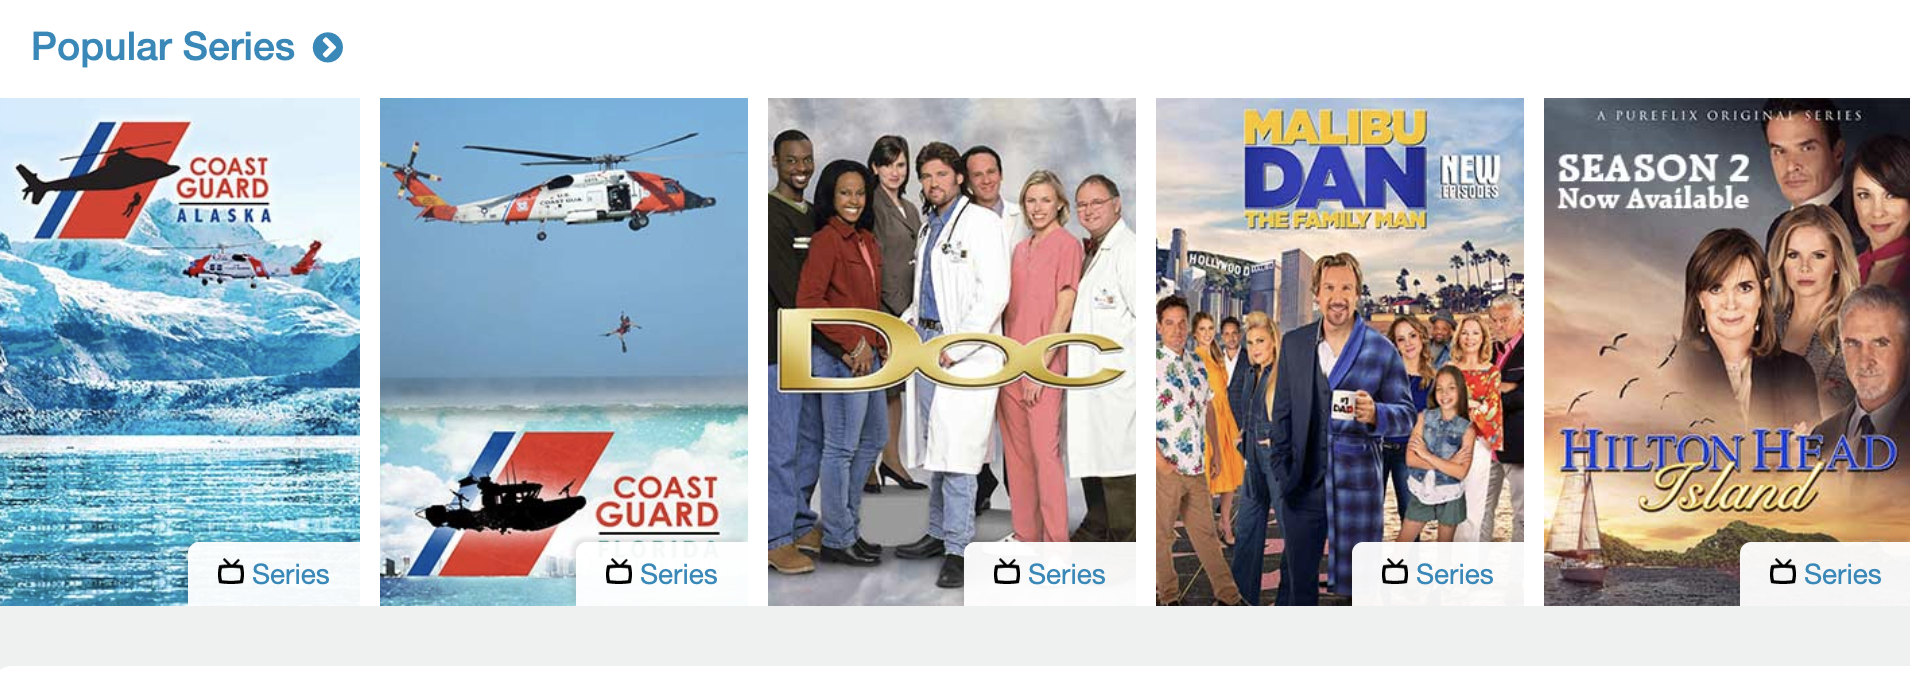 popular series on Pure Flix